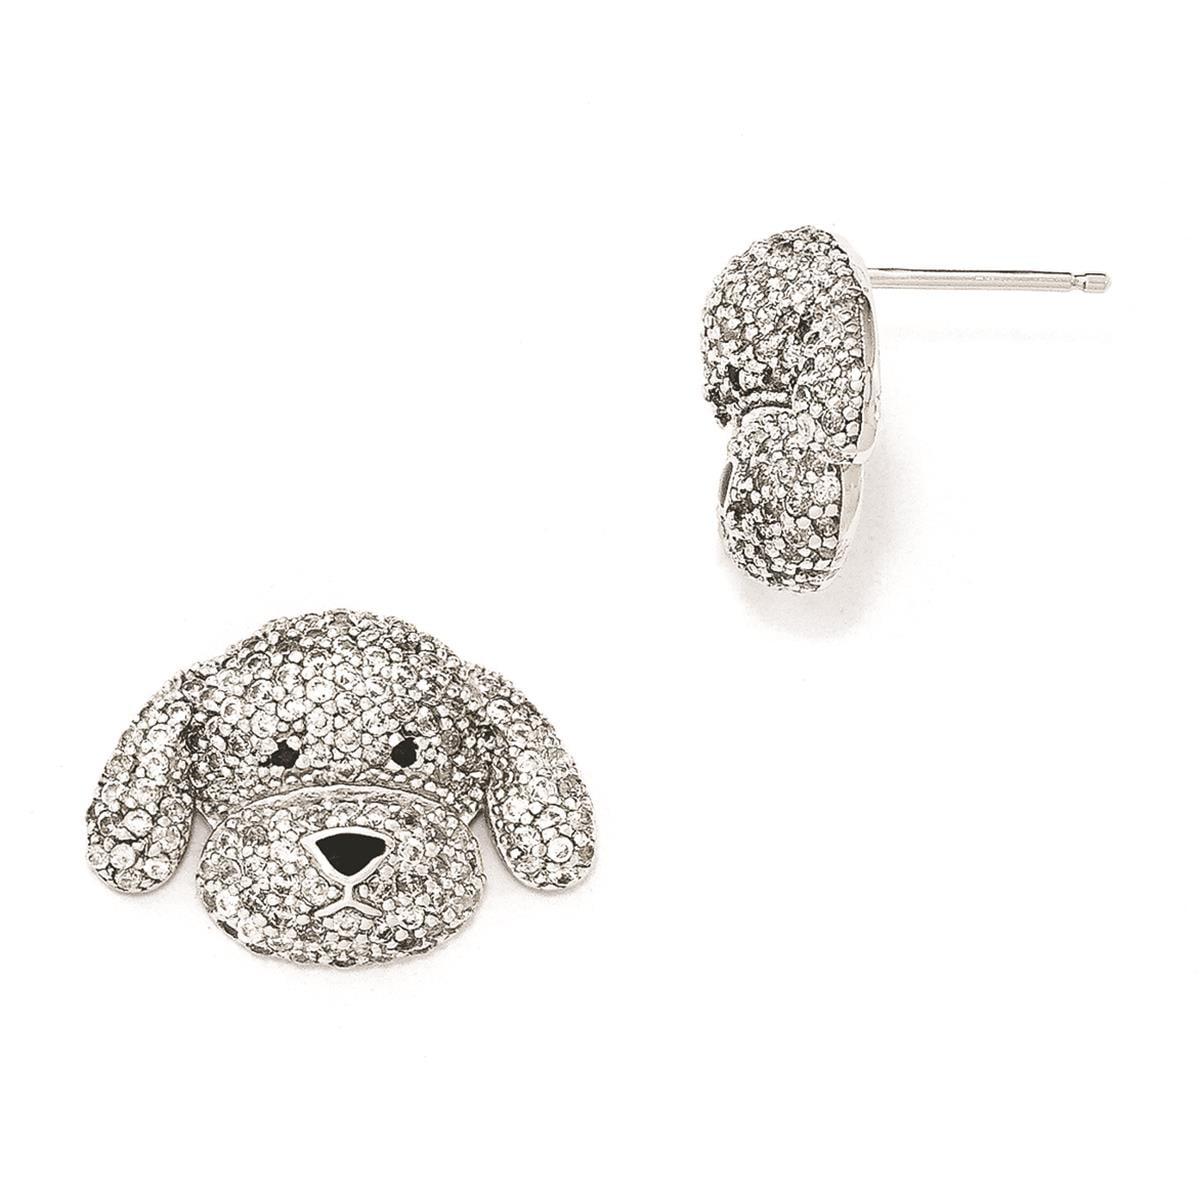 Cheryl M Ladies & Kids 925 SS Enameled CZ Puppy Post Earrings 21mm x 15mm